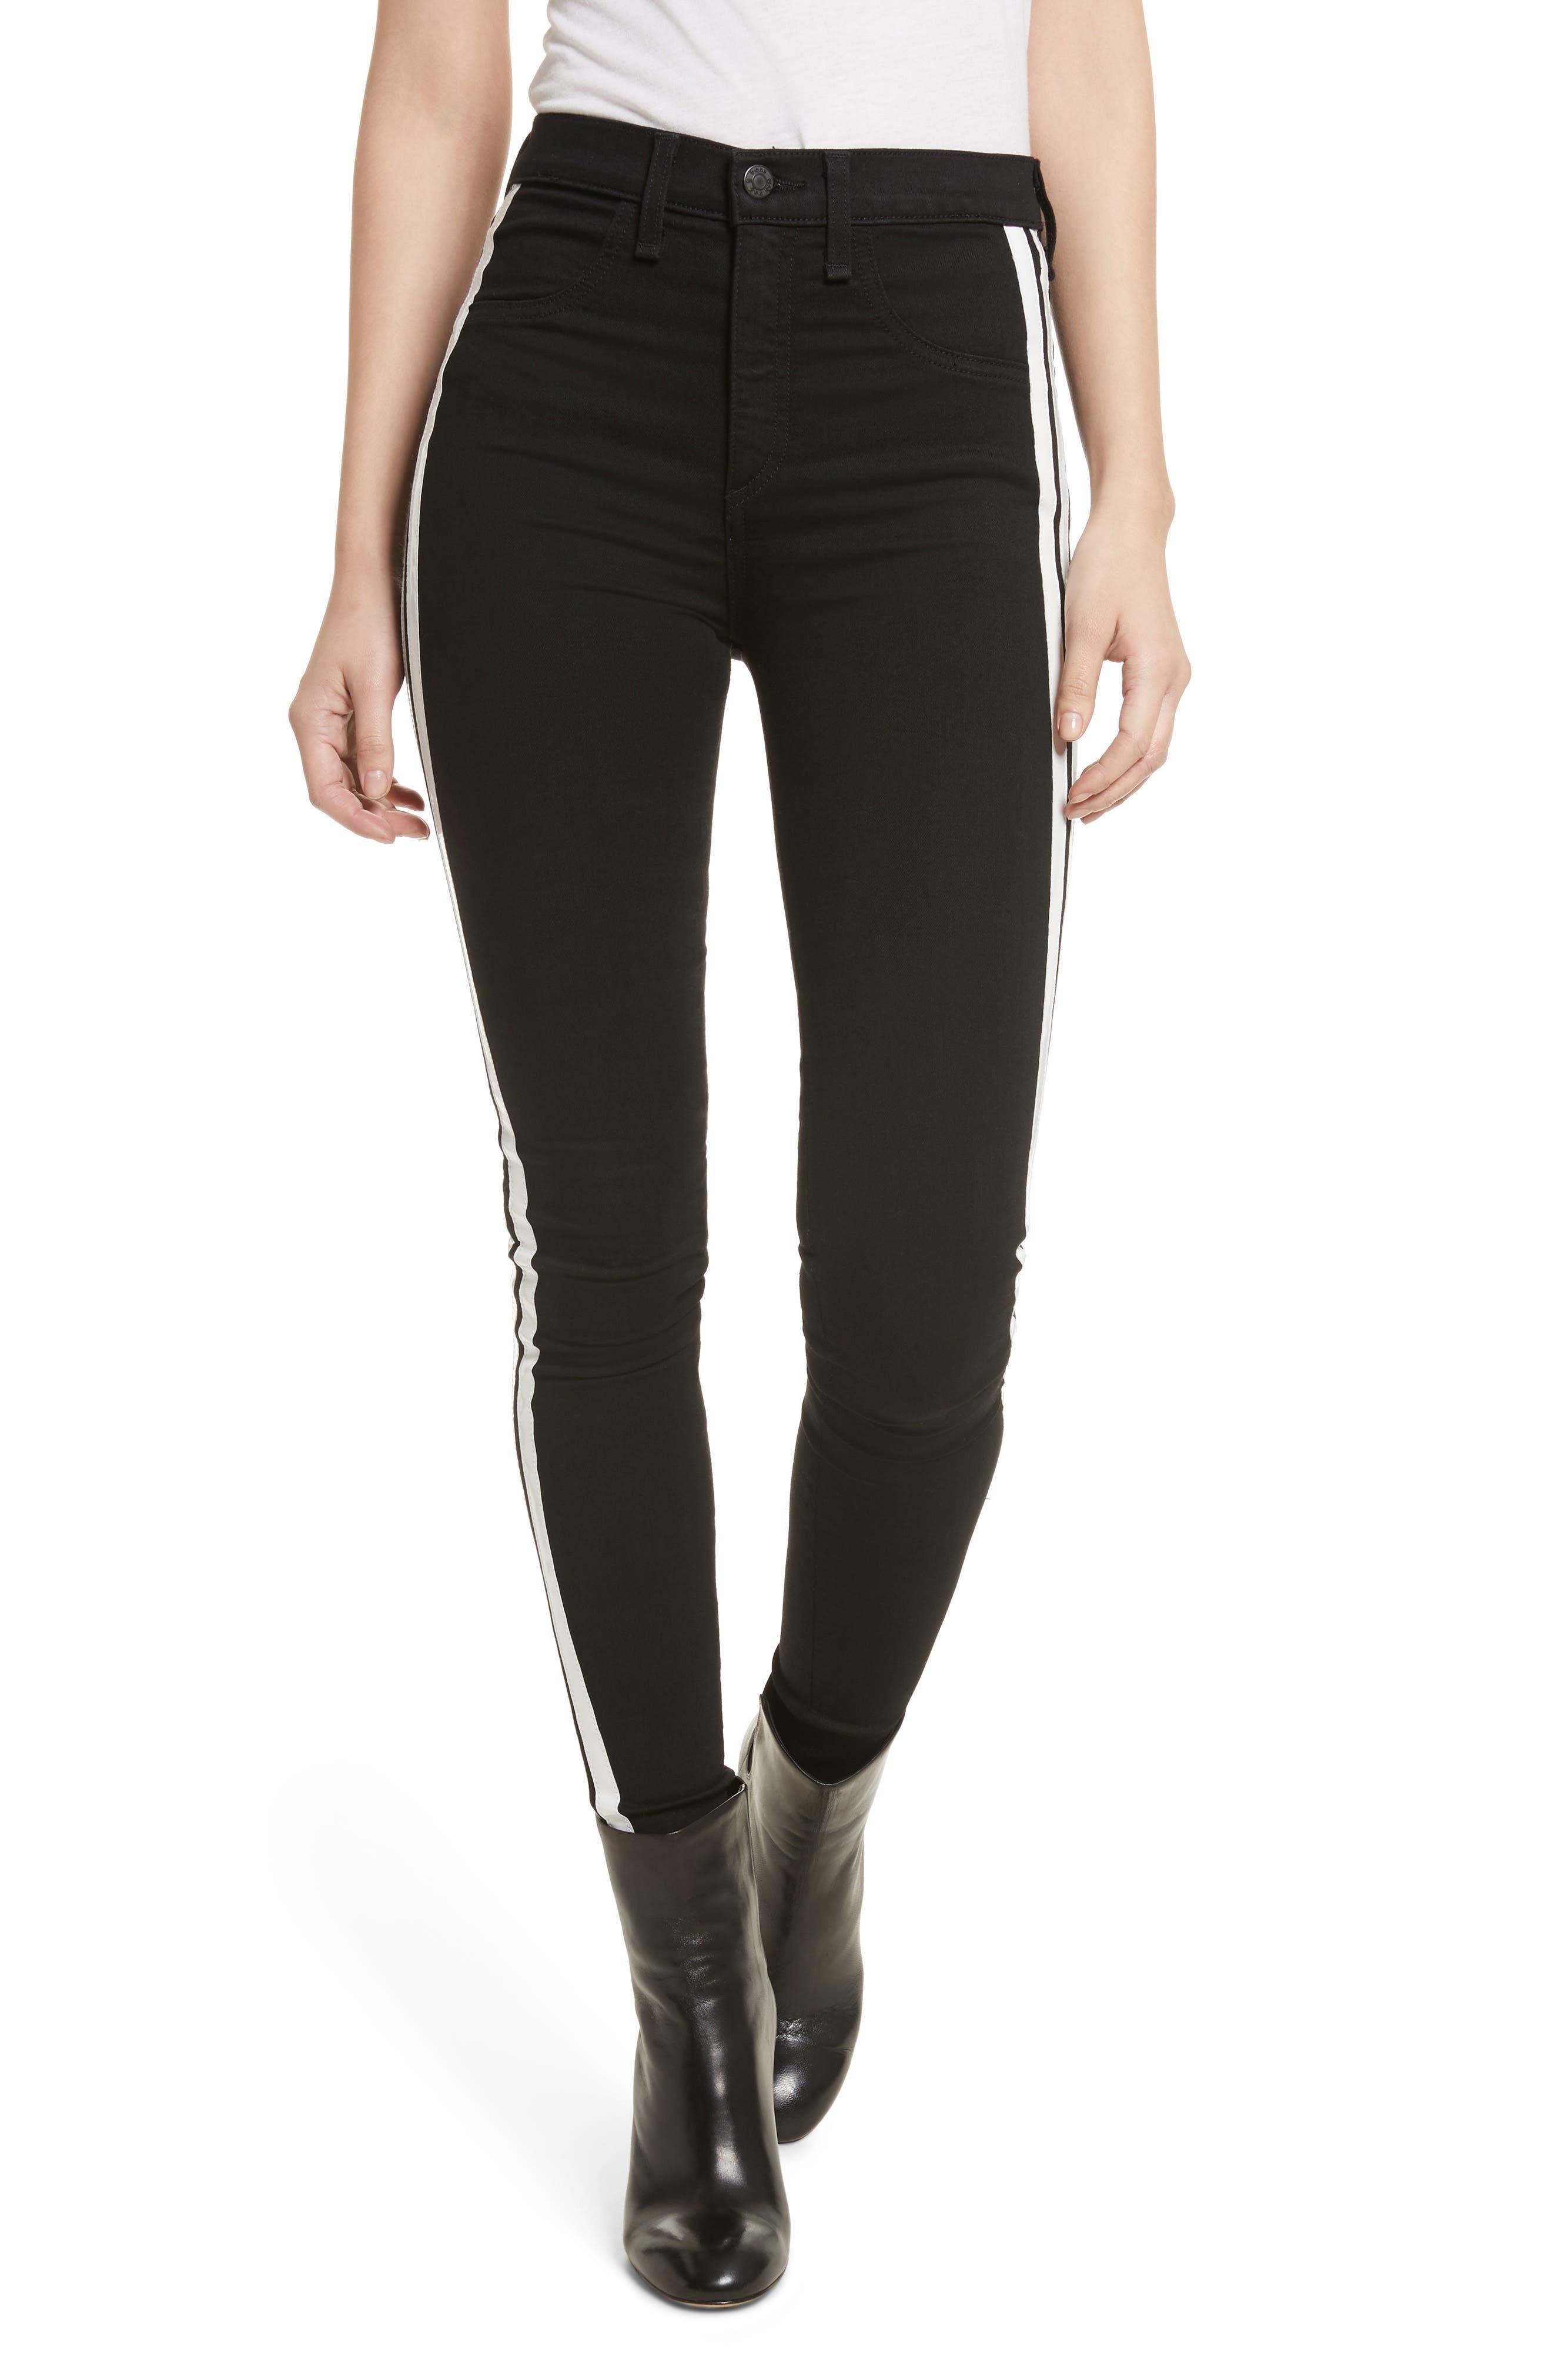 Mito High Waist Skinny Jeans,                             Main thumbnail 1, color,                             Black